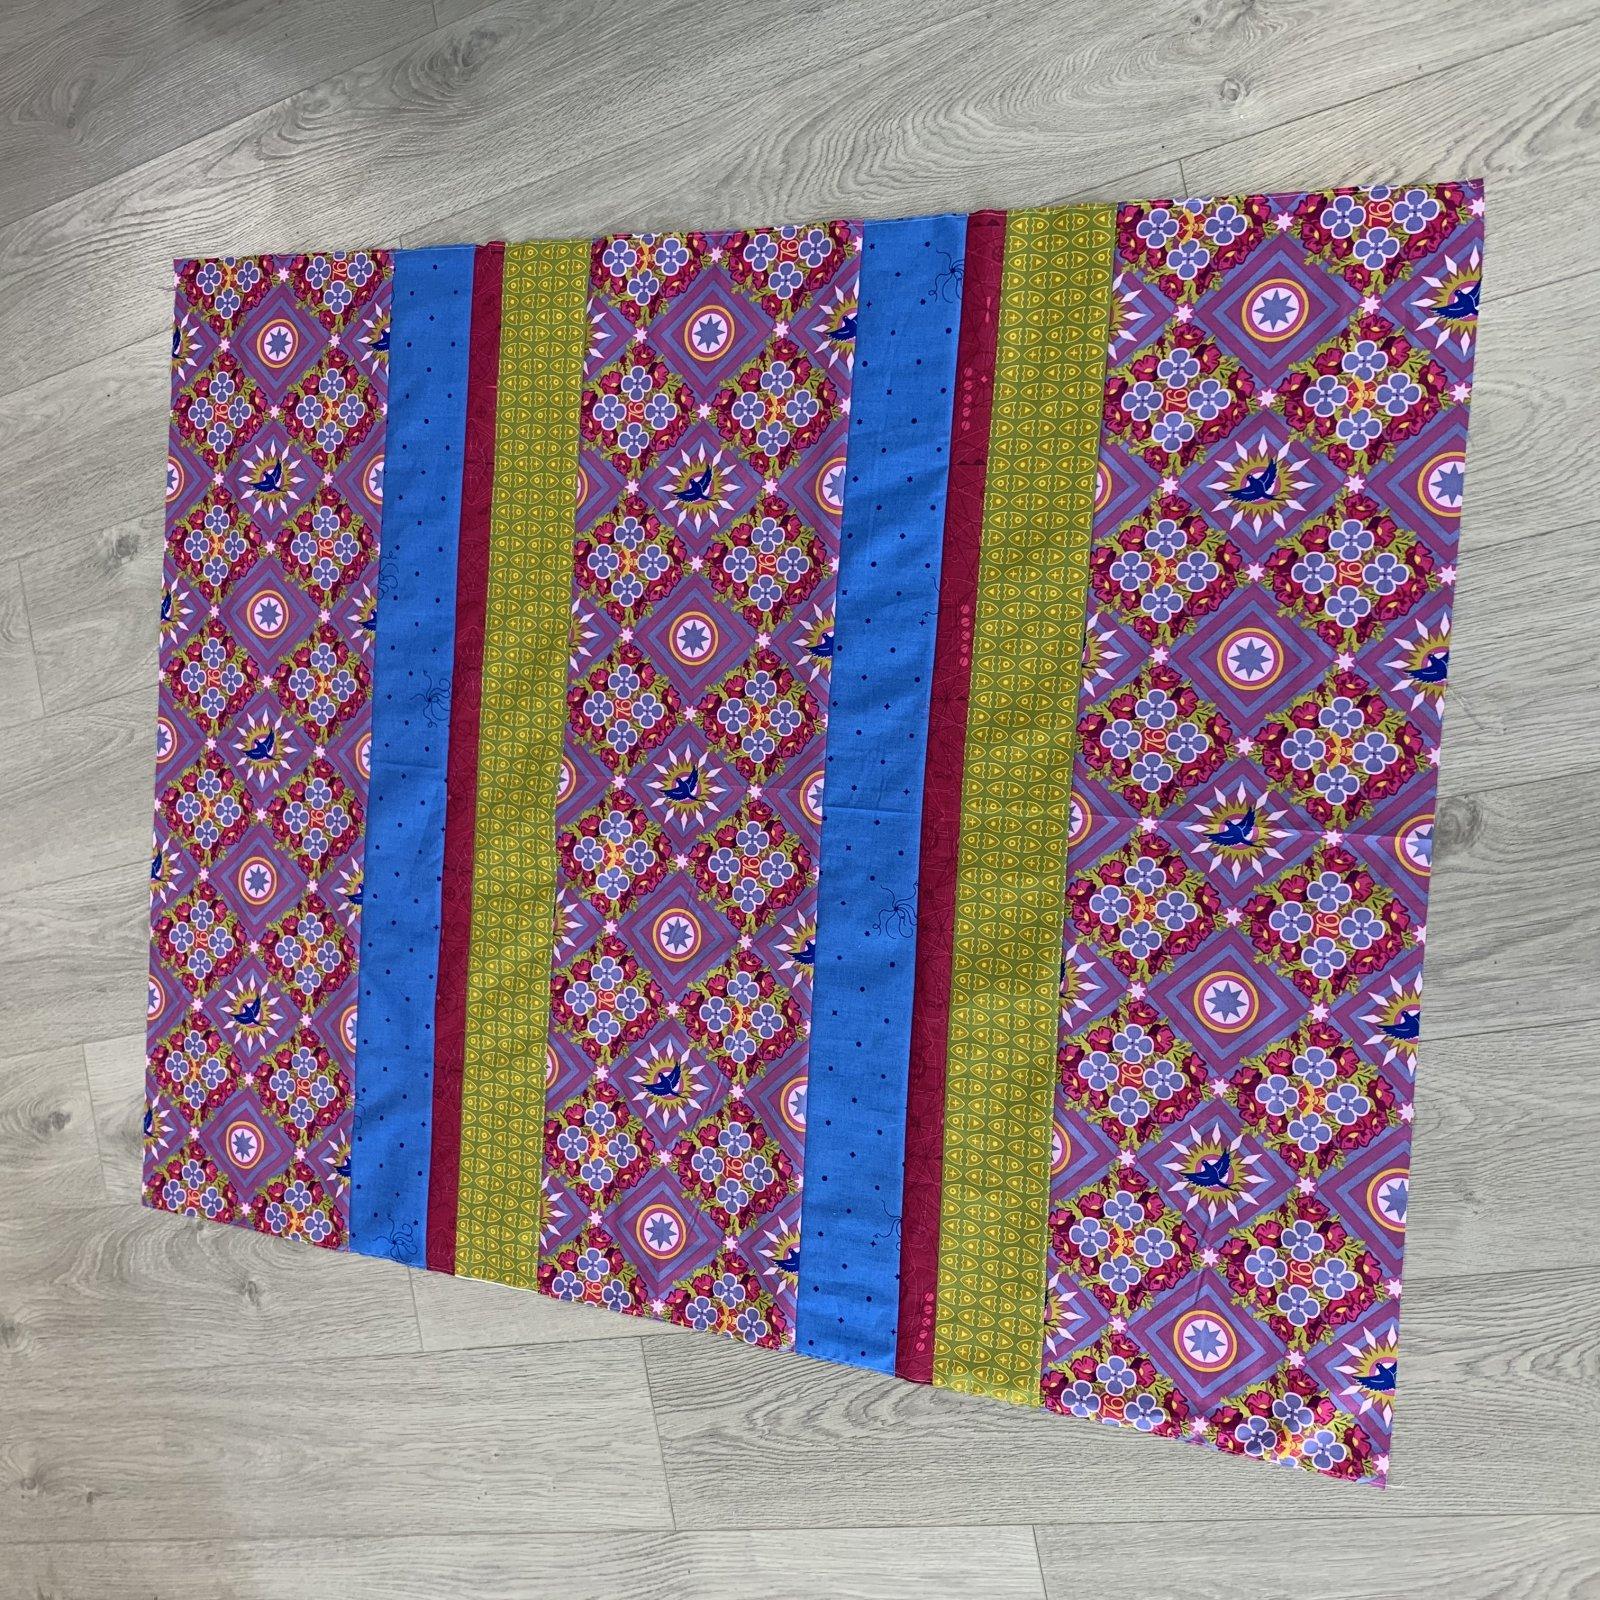 Strip Quilt - Alison Glass 3